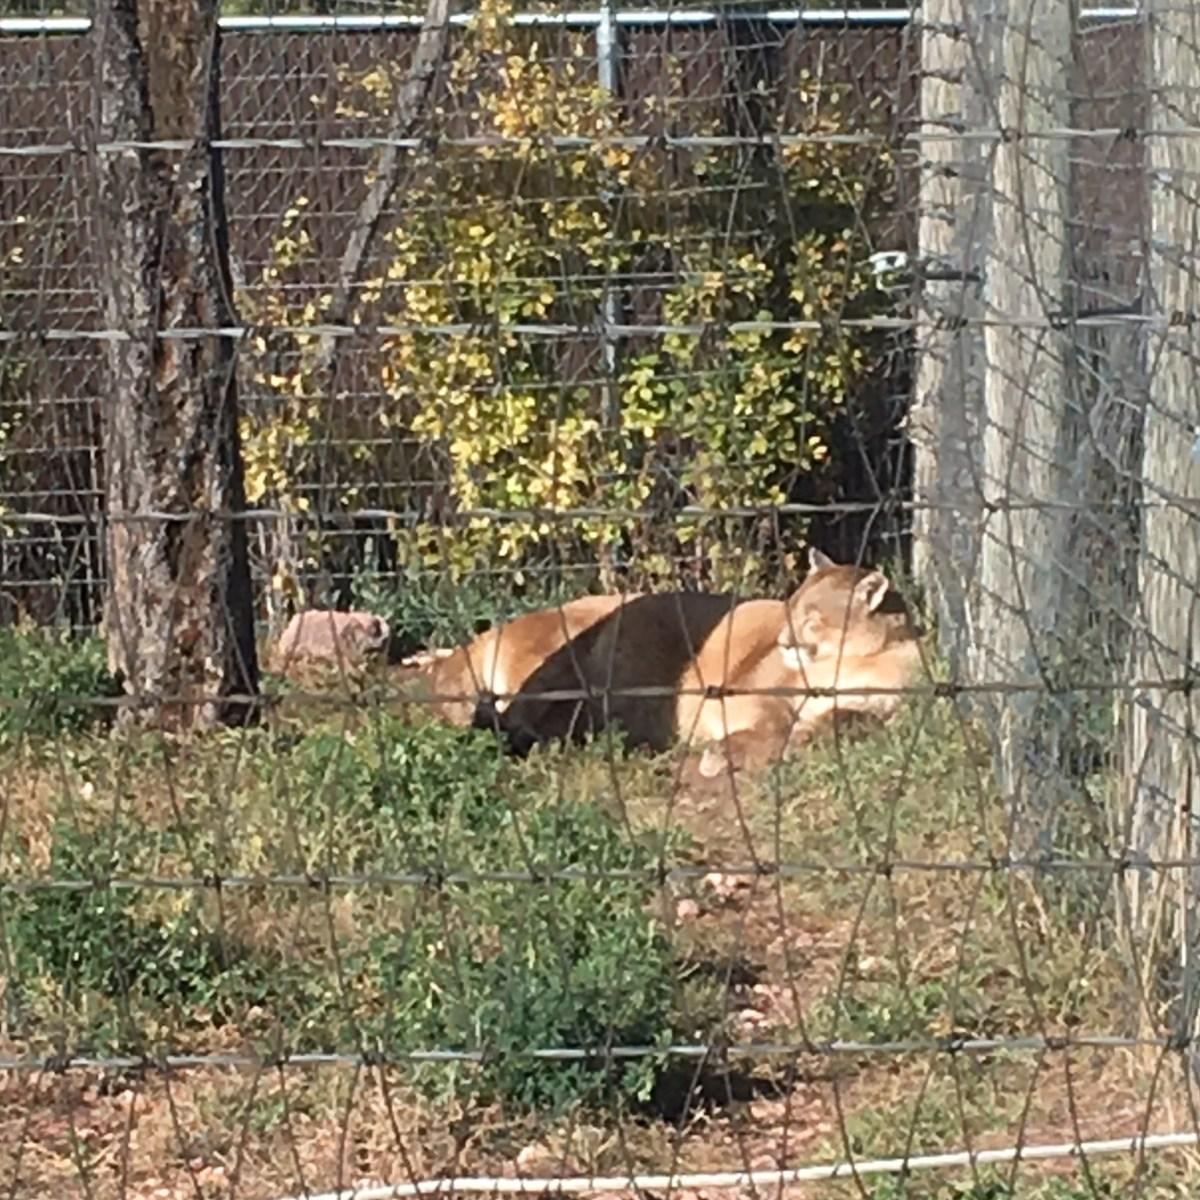 Mountain Lion at Bear Country USA South Dakota